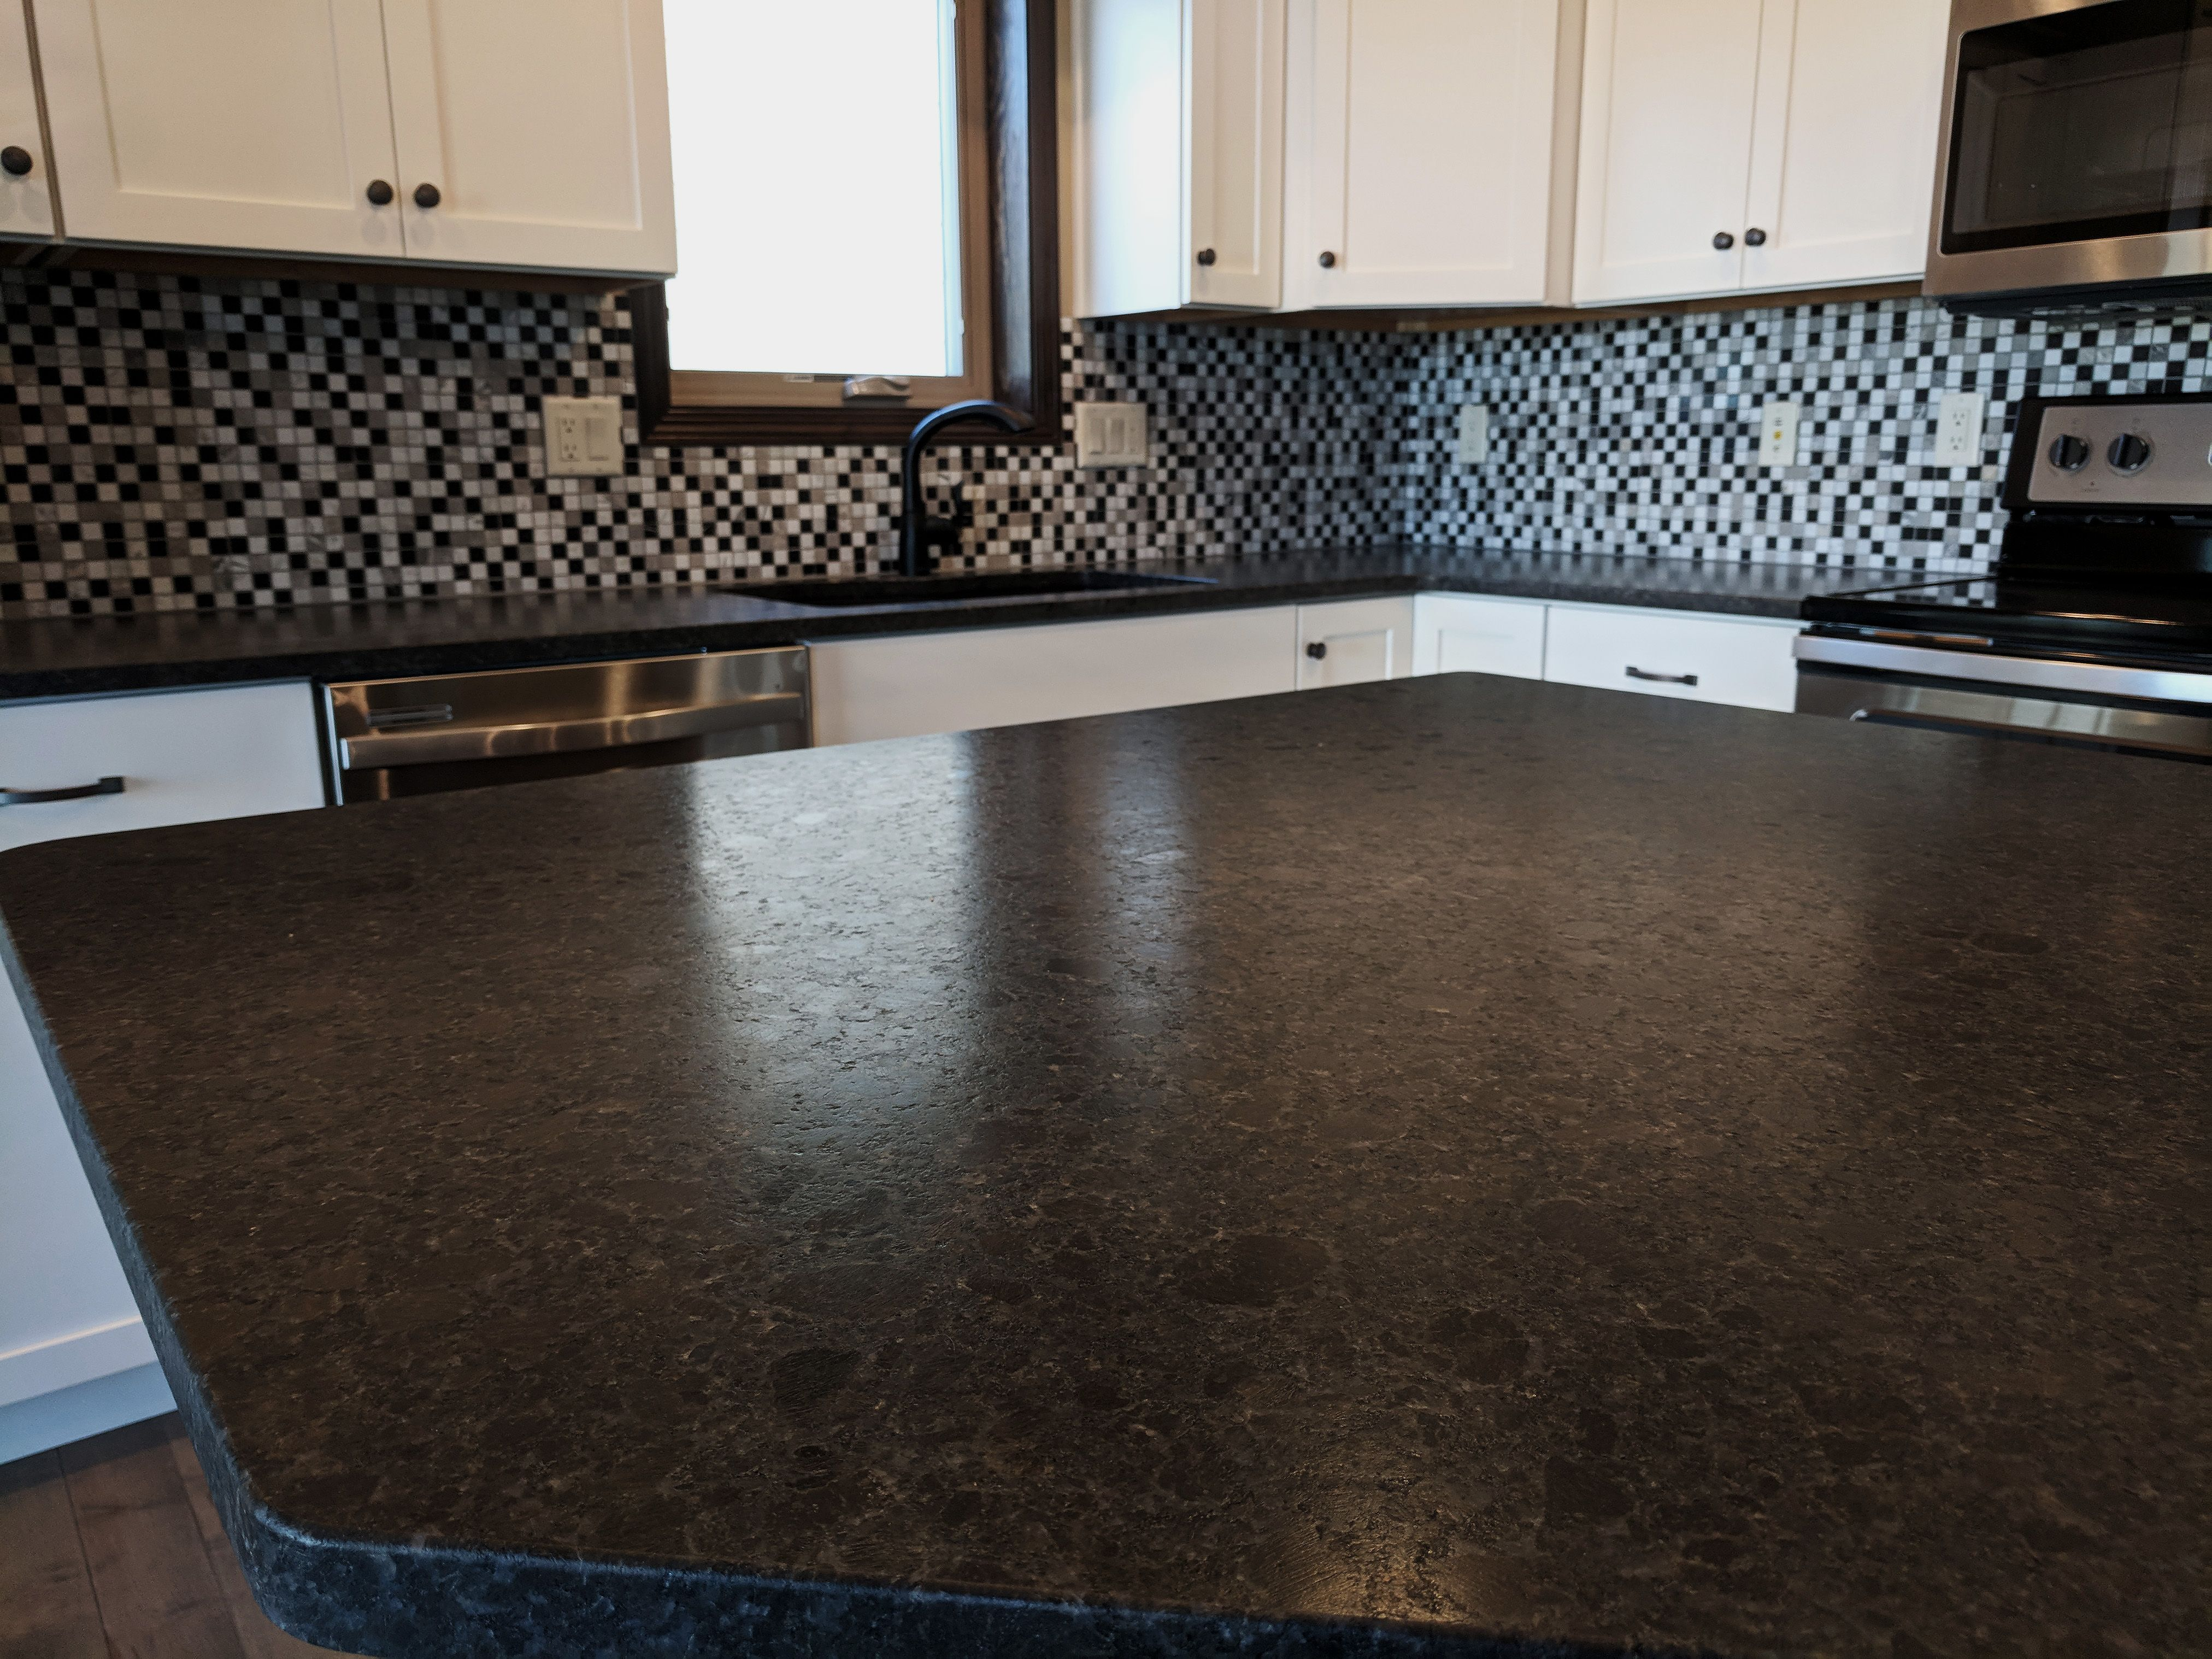 Coffee Brown Leathered Granite Countertops From India Bathroom Countertops Granite Bathroom Countertops Brown Granite Countertops